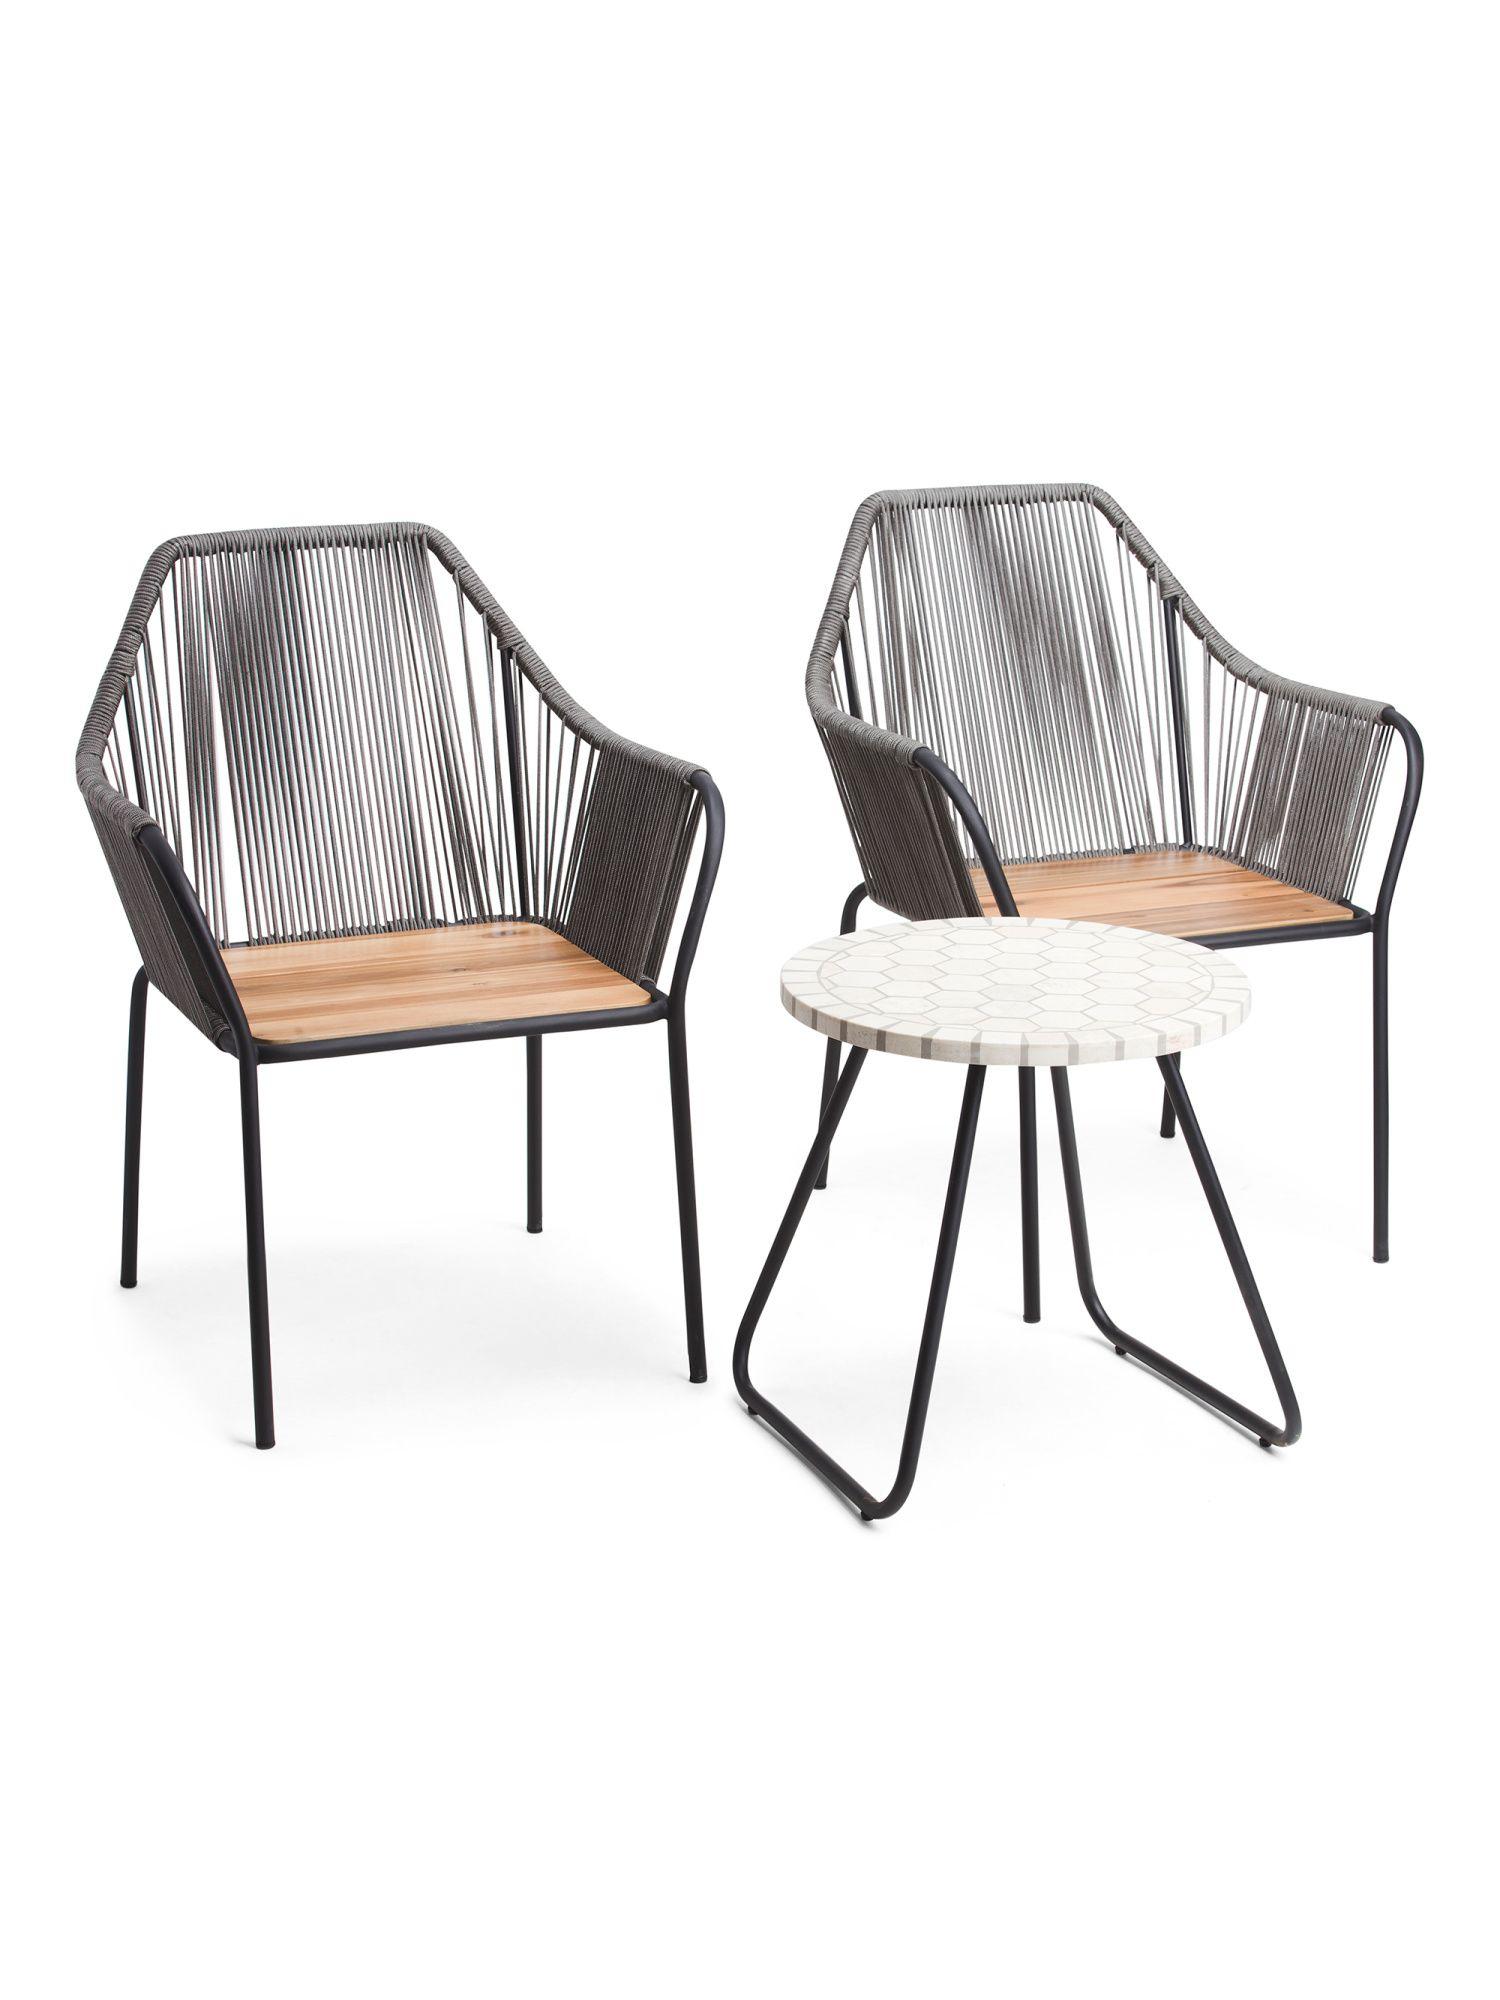 3pc Rope Bistro Set Seating T J Maxx In 2020 Bistro Set Ikea Patio Furniture Ikea Patio